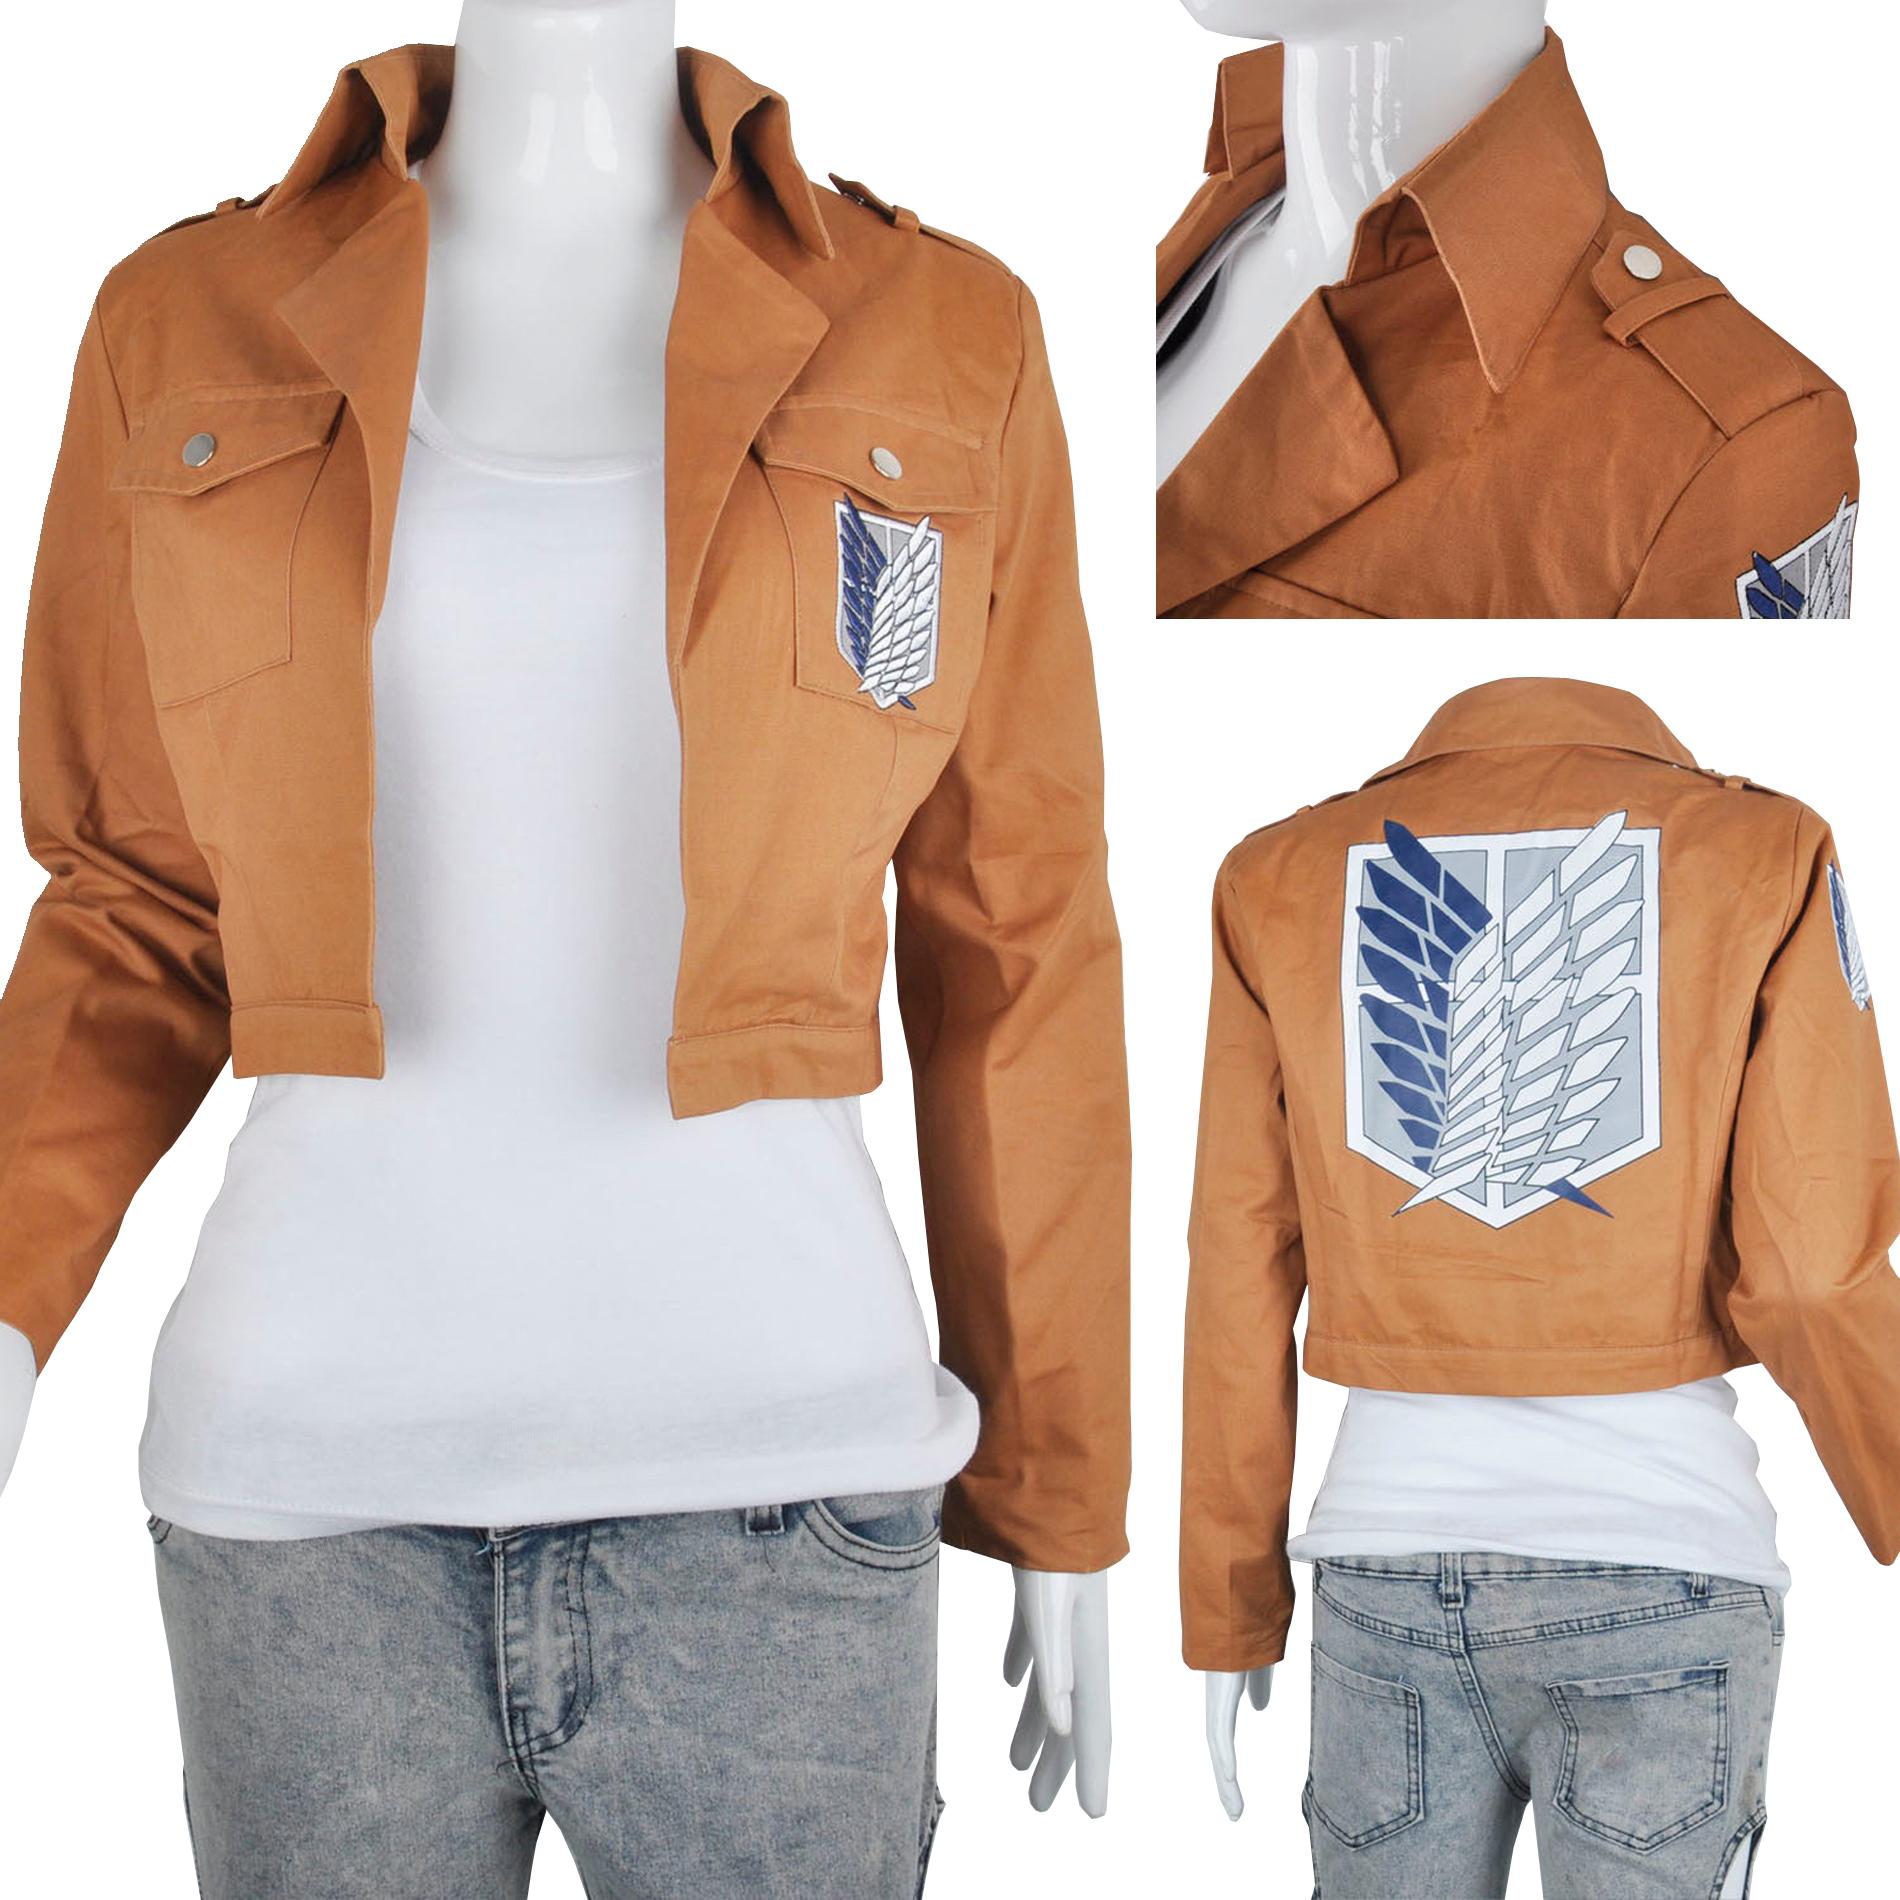 Khaki Anime Attack on Titan Jacket Coat Cosplay Costumes Clothes